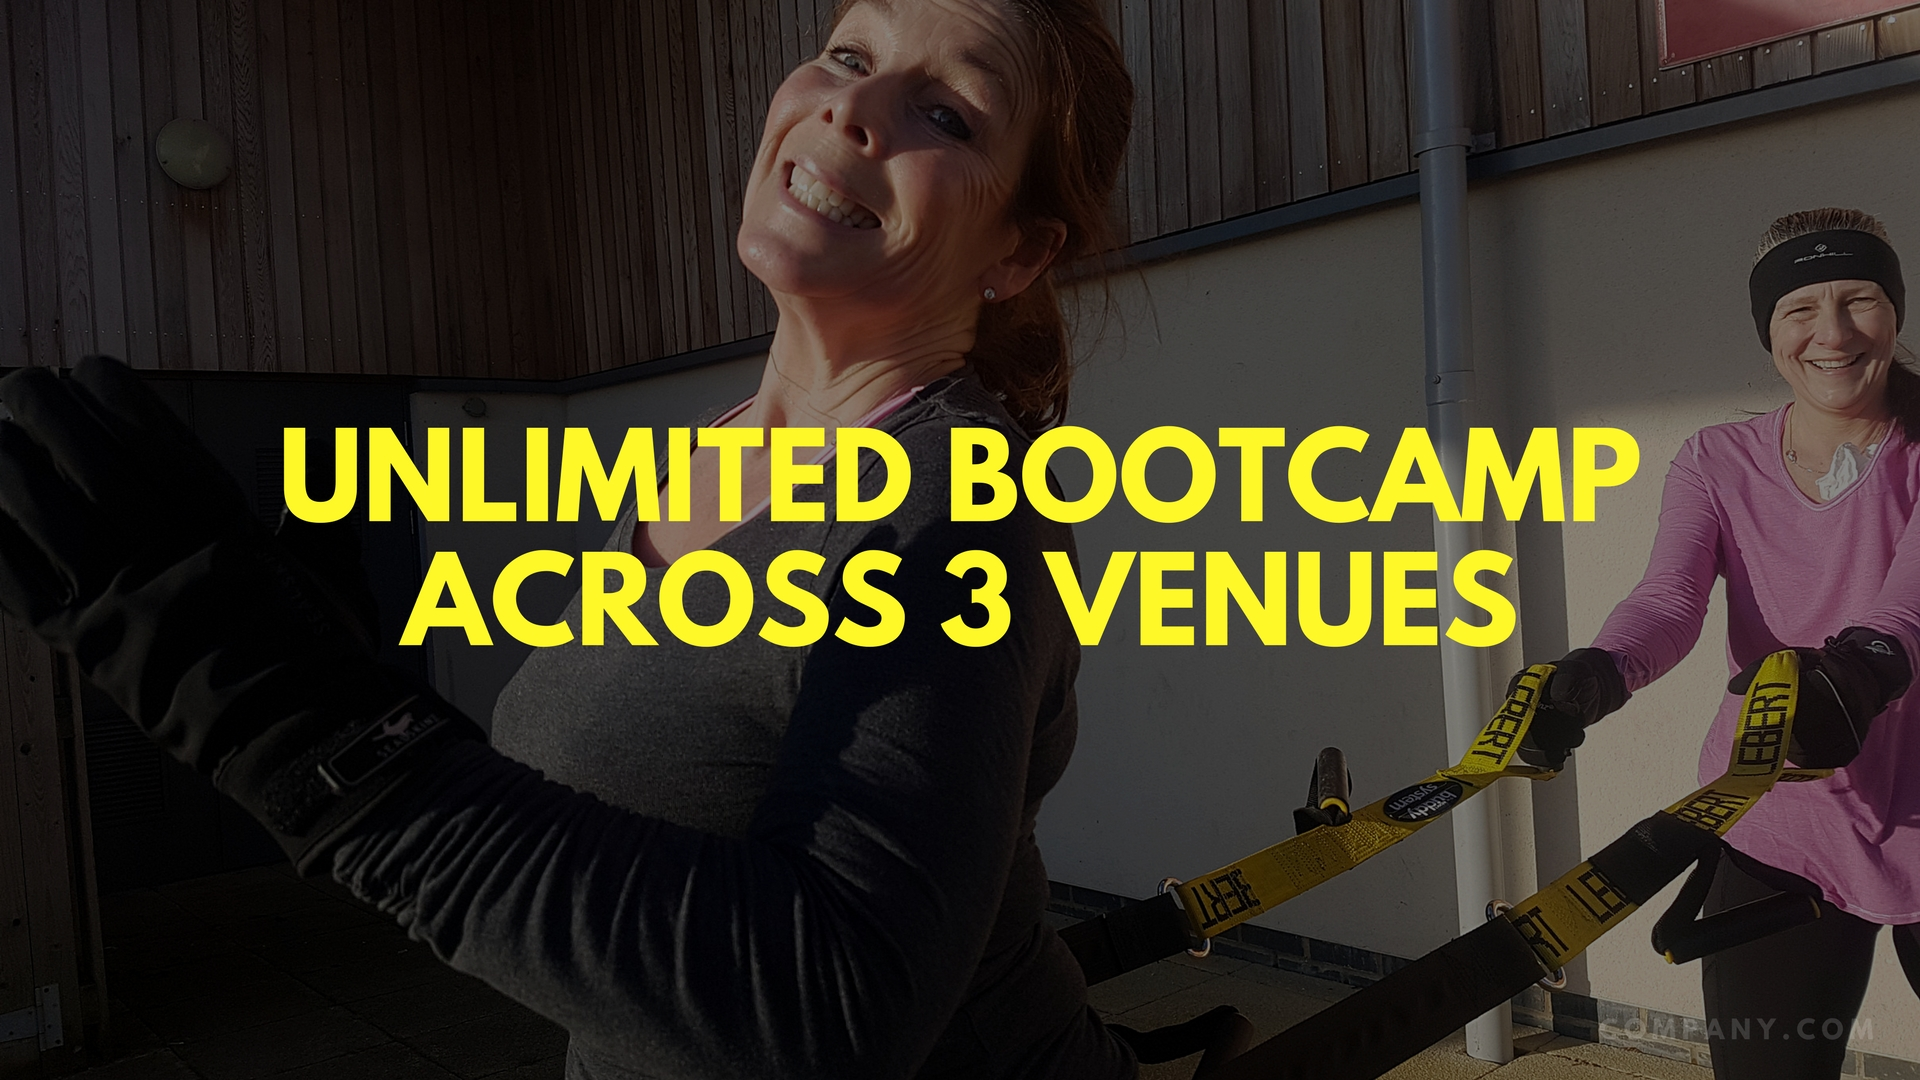 Peak Fitness bootcamp (1).jpg